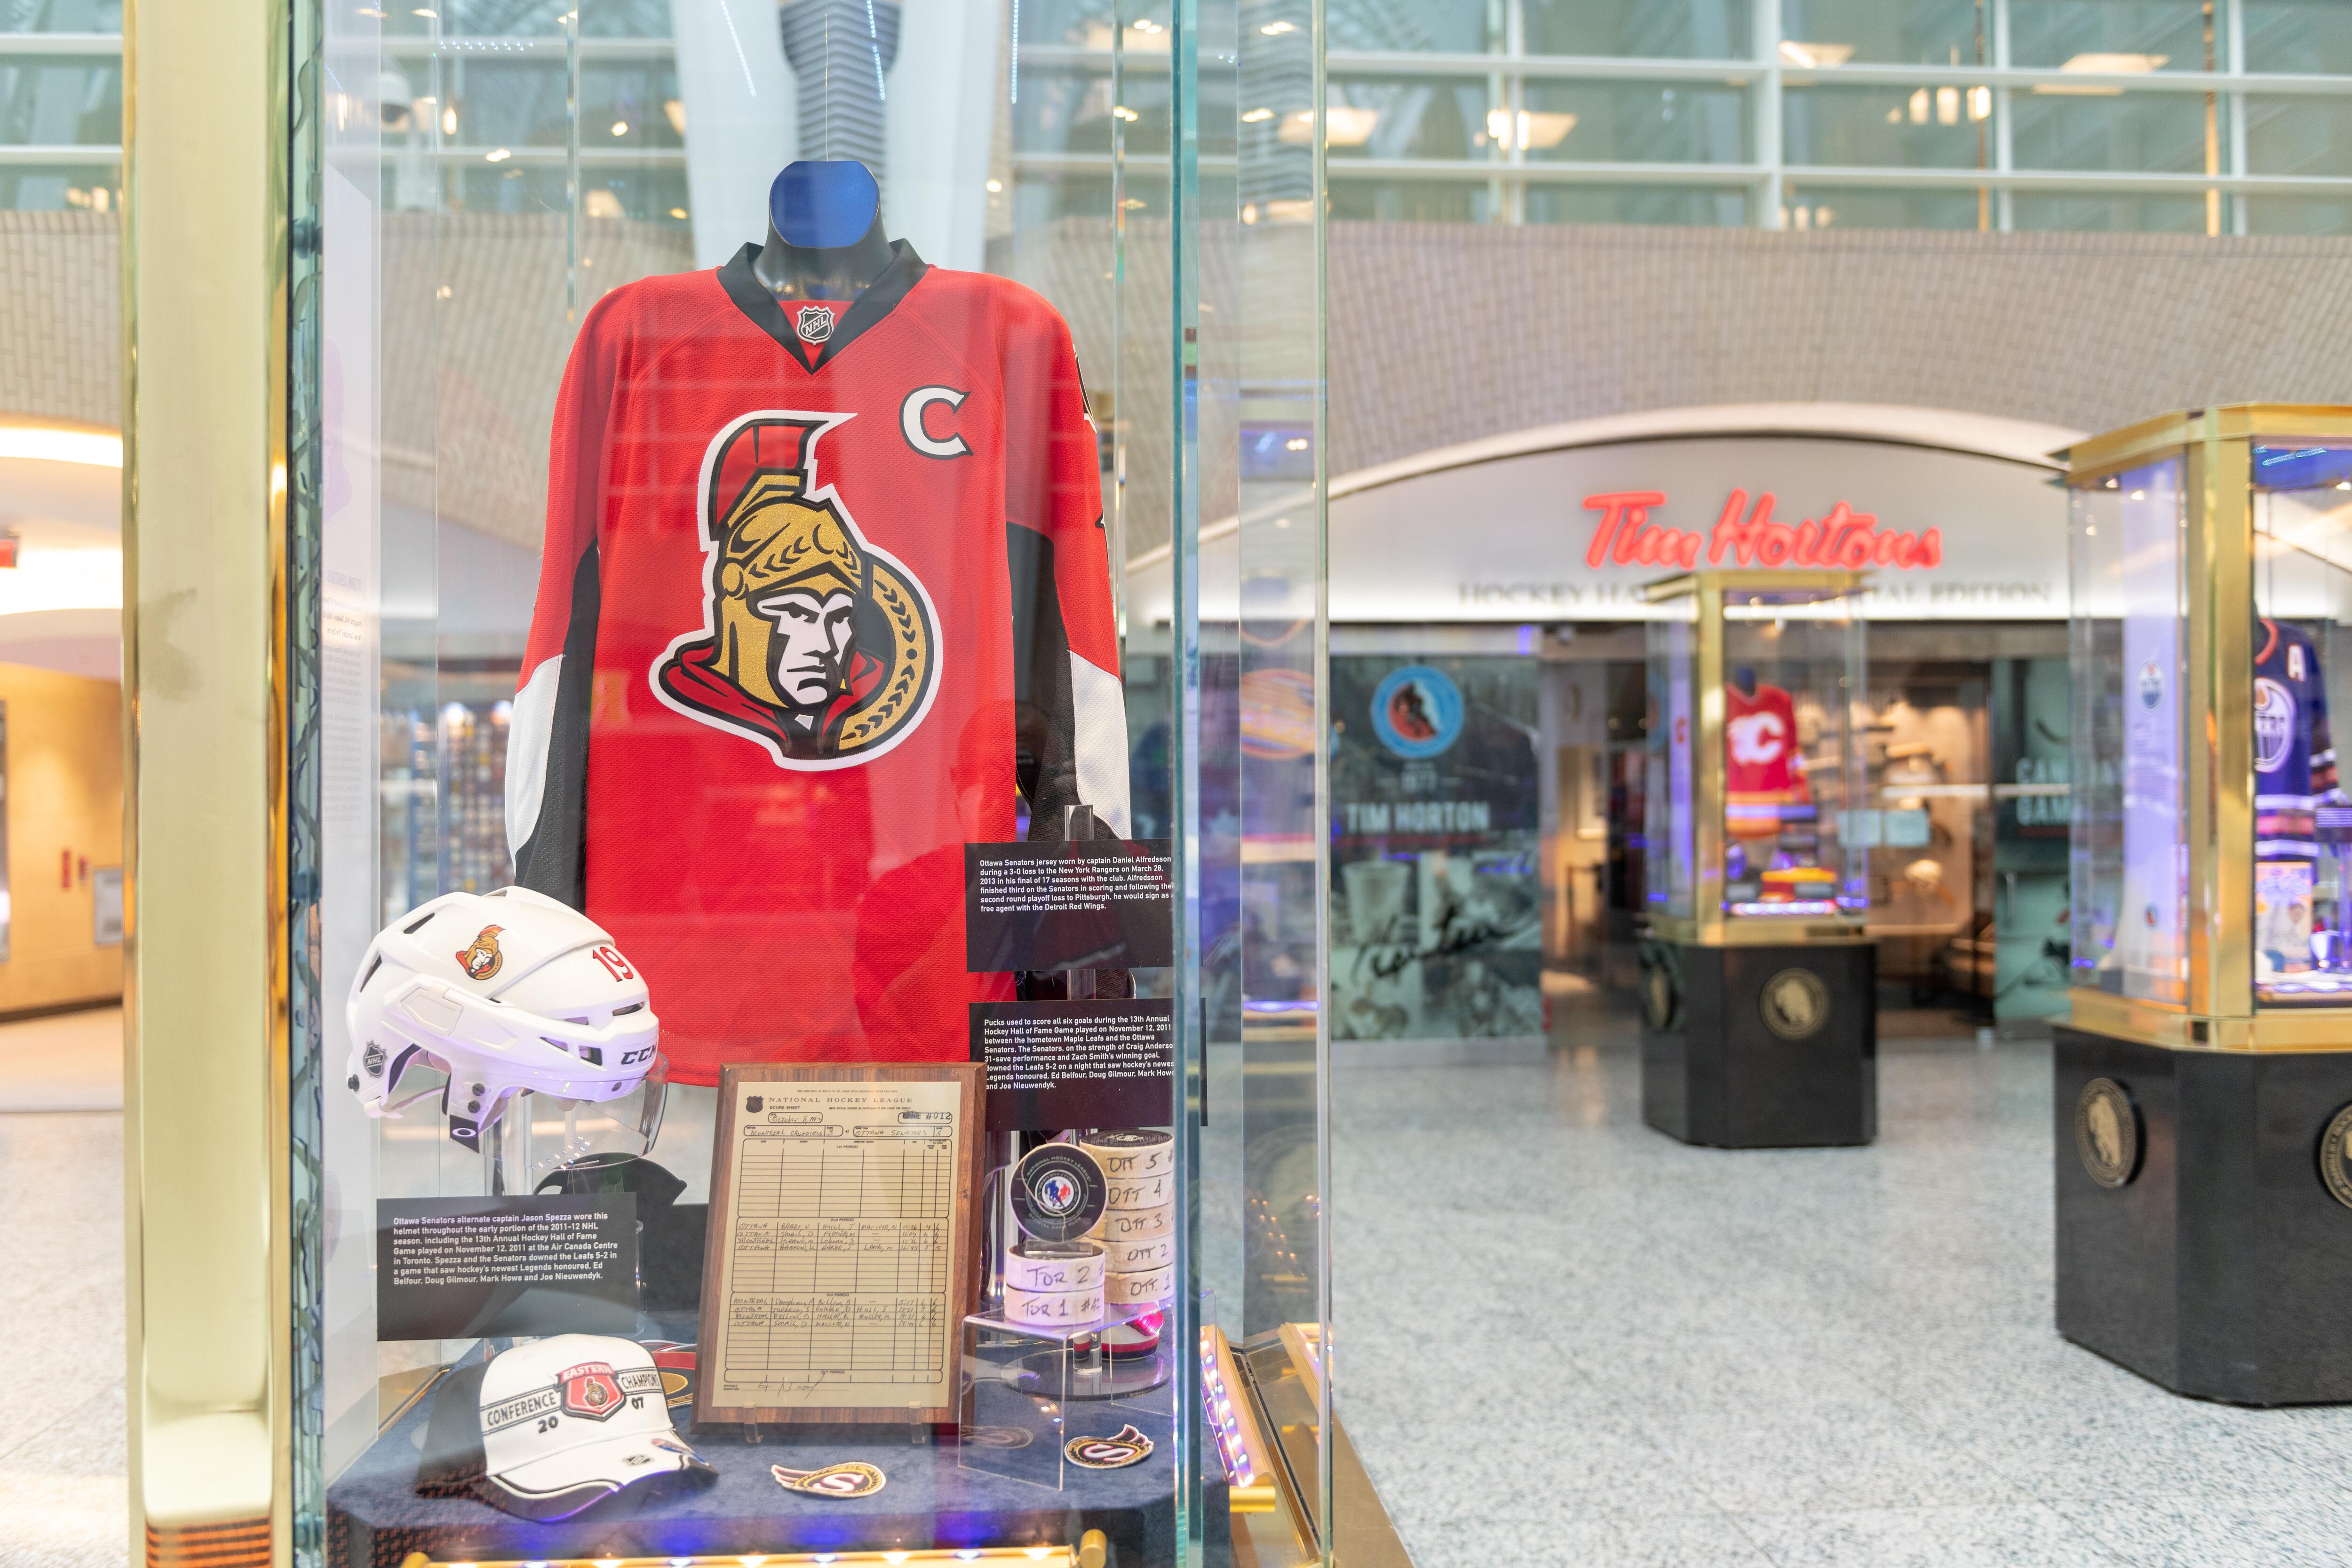 Ottawa Senators uniform exhibit at the Spirit of Hockey...